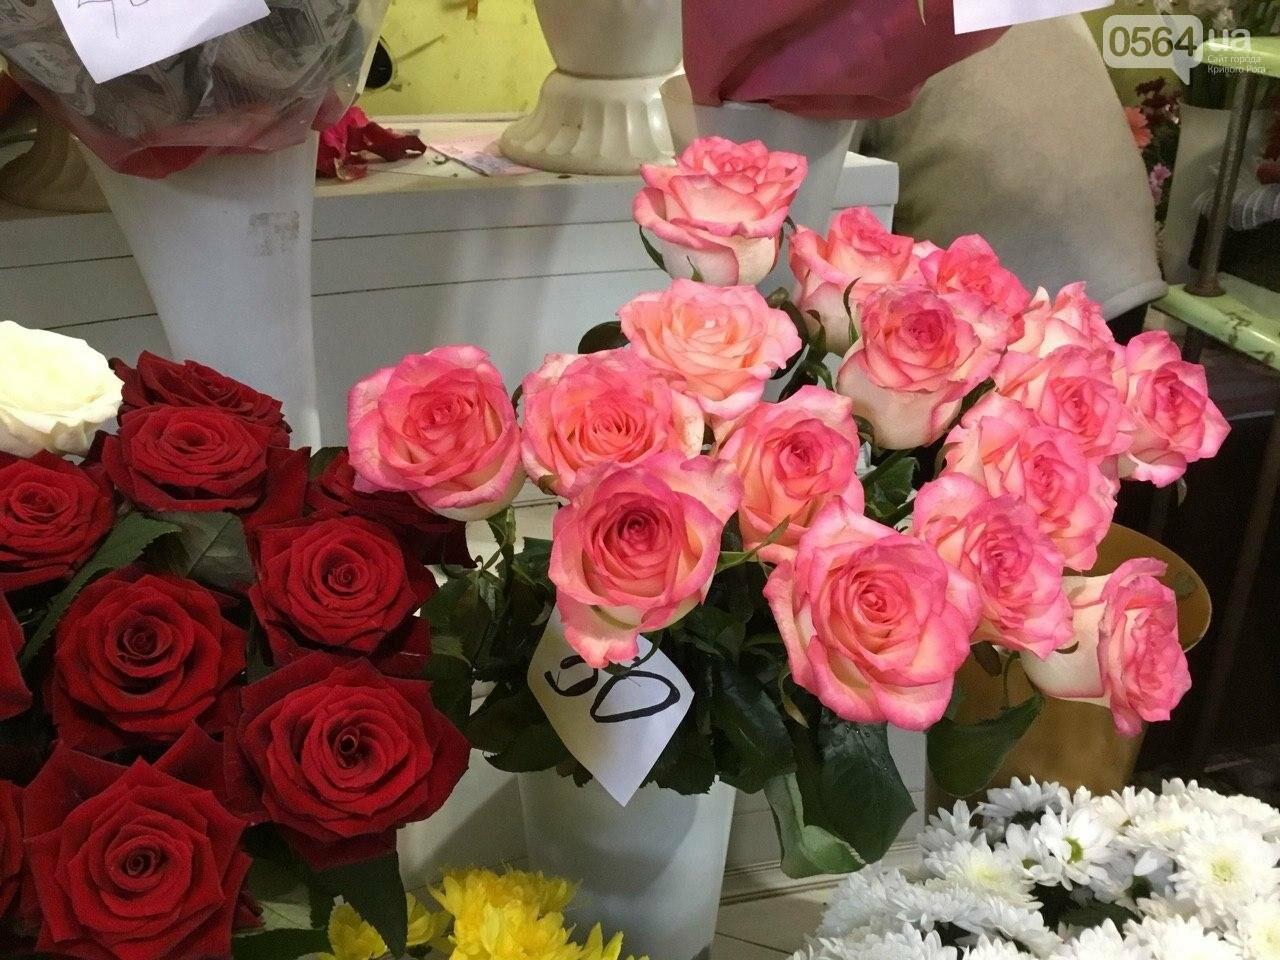 Сколько стоят примула, цикламен, мимоза? Обзор цен на цветы в Кривом Роге, - ФОТО, ВИДЕО, фото-12